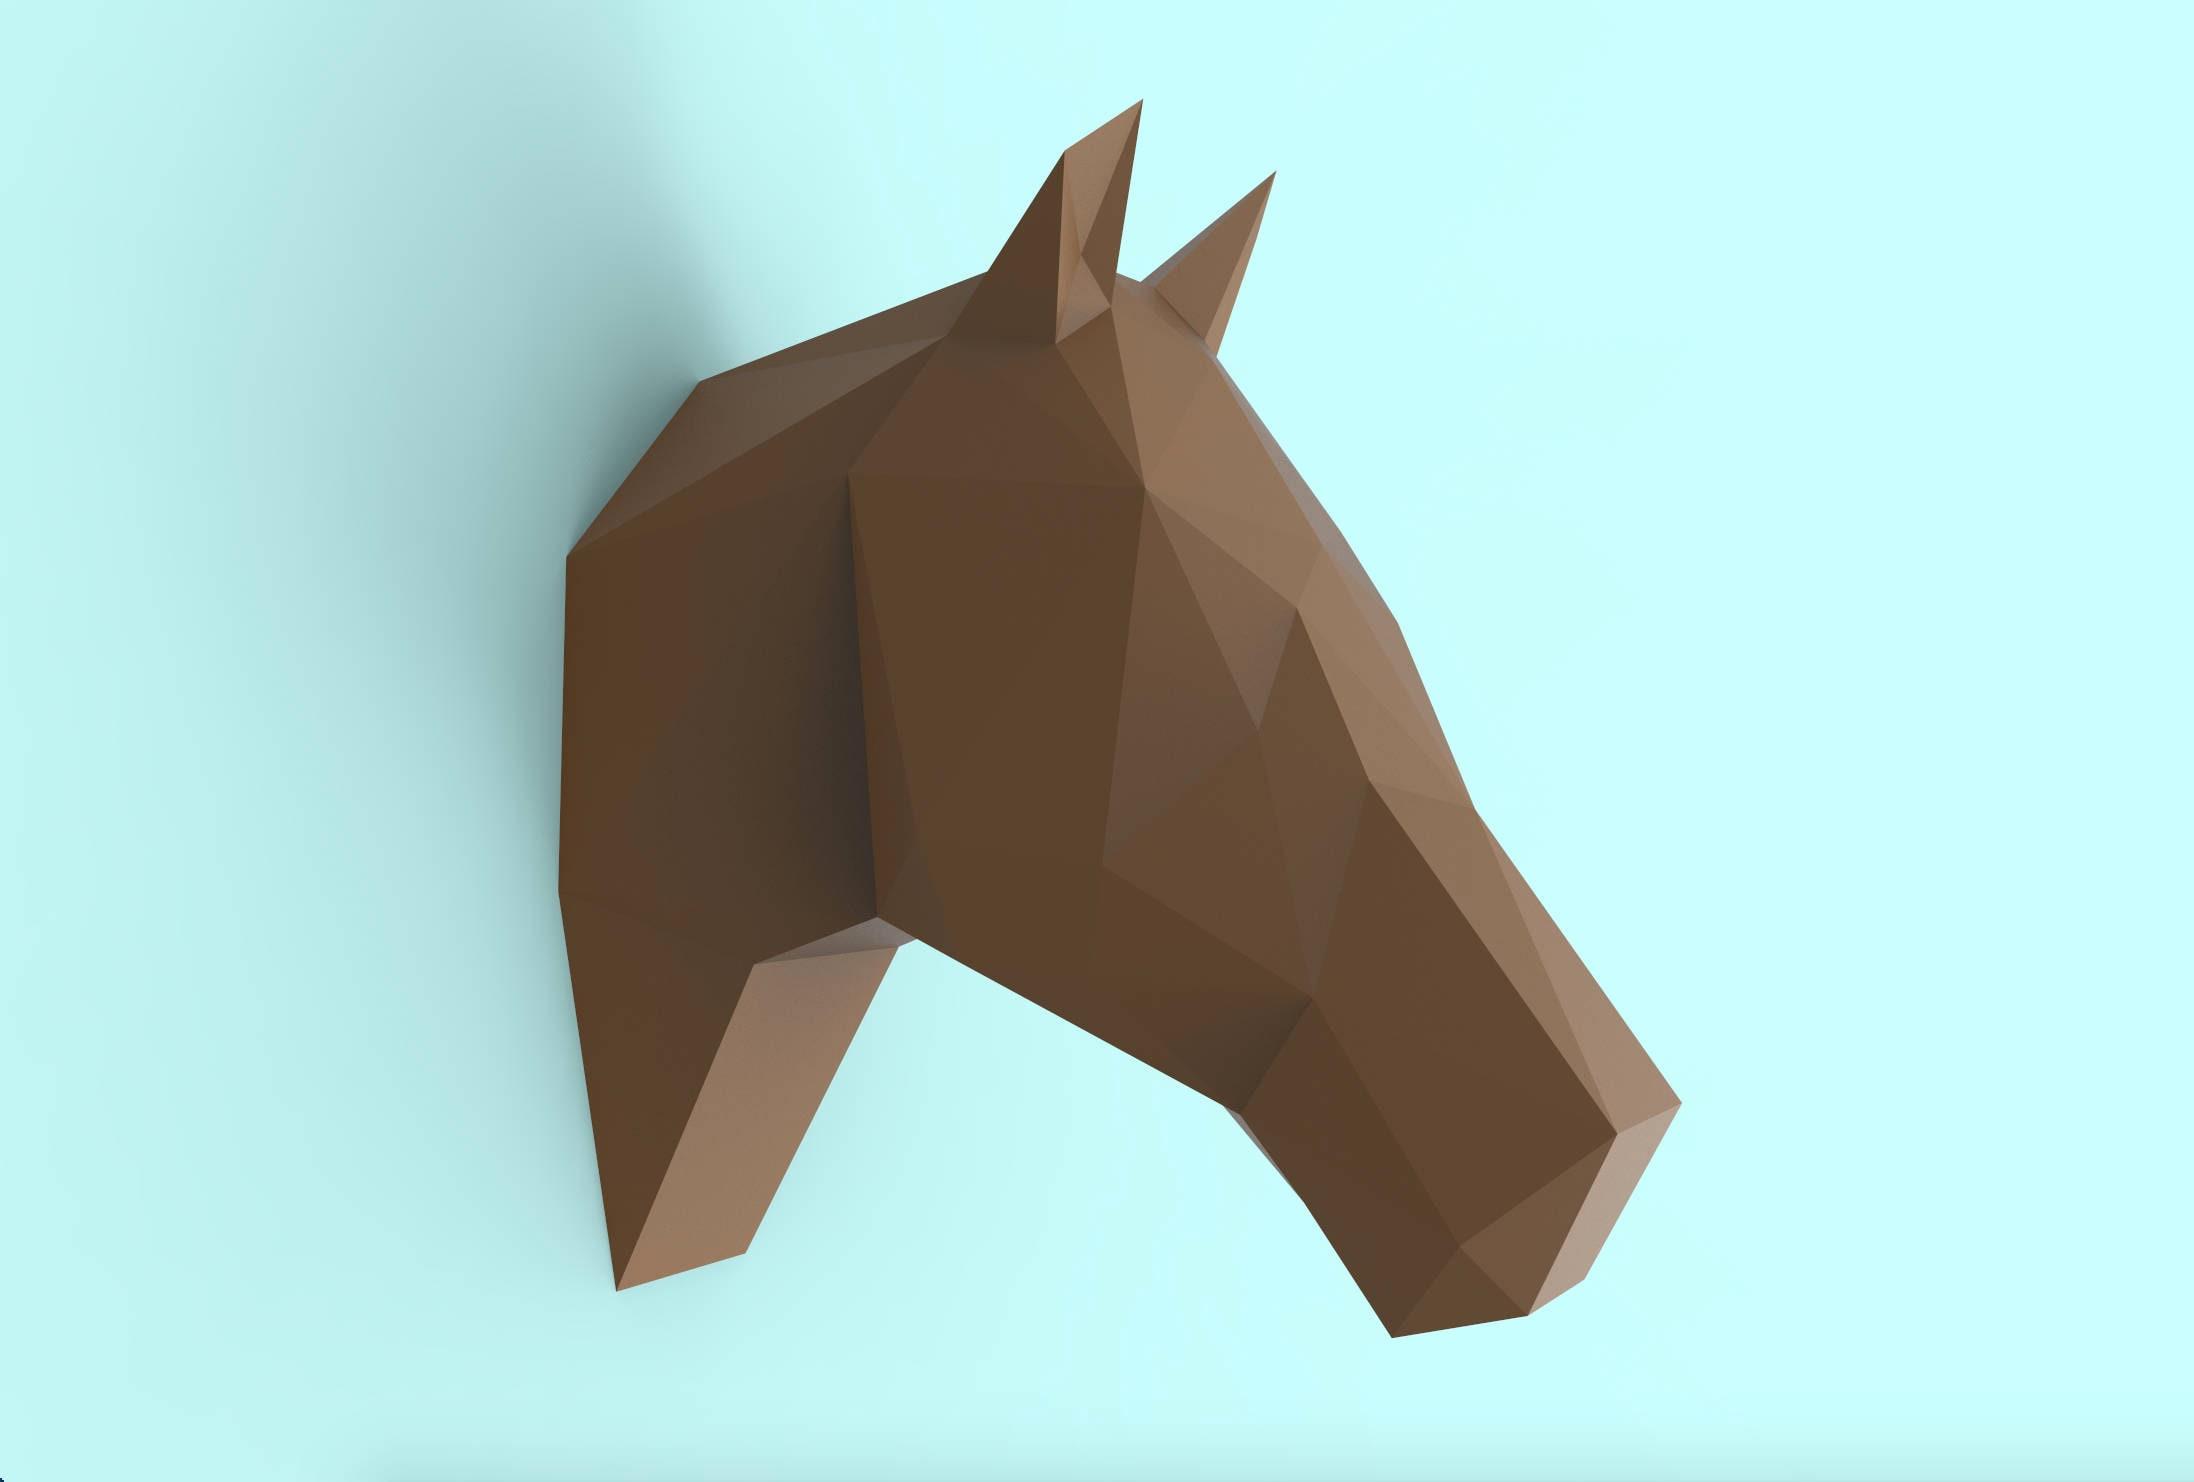 Horse Head Papercraft PDF Pack 3D Paper Sculpture Template